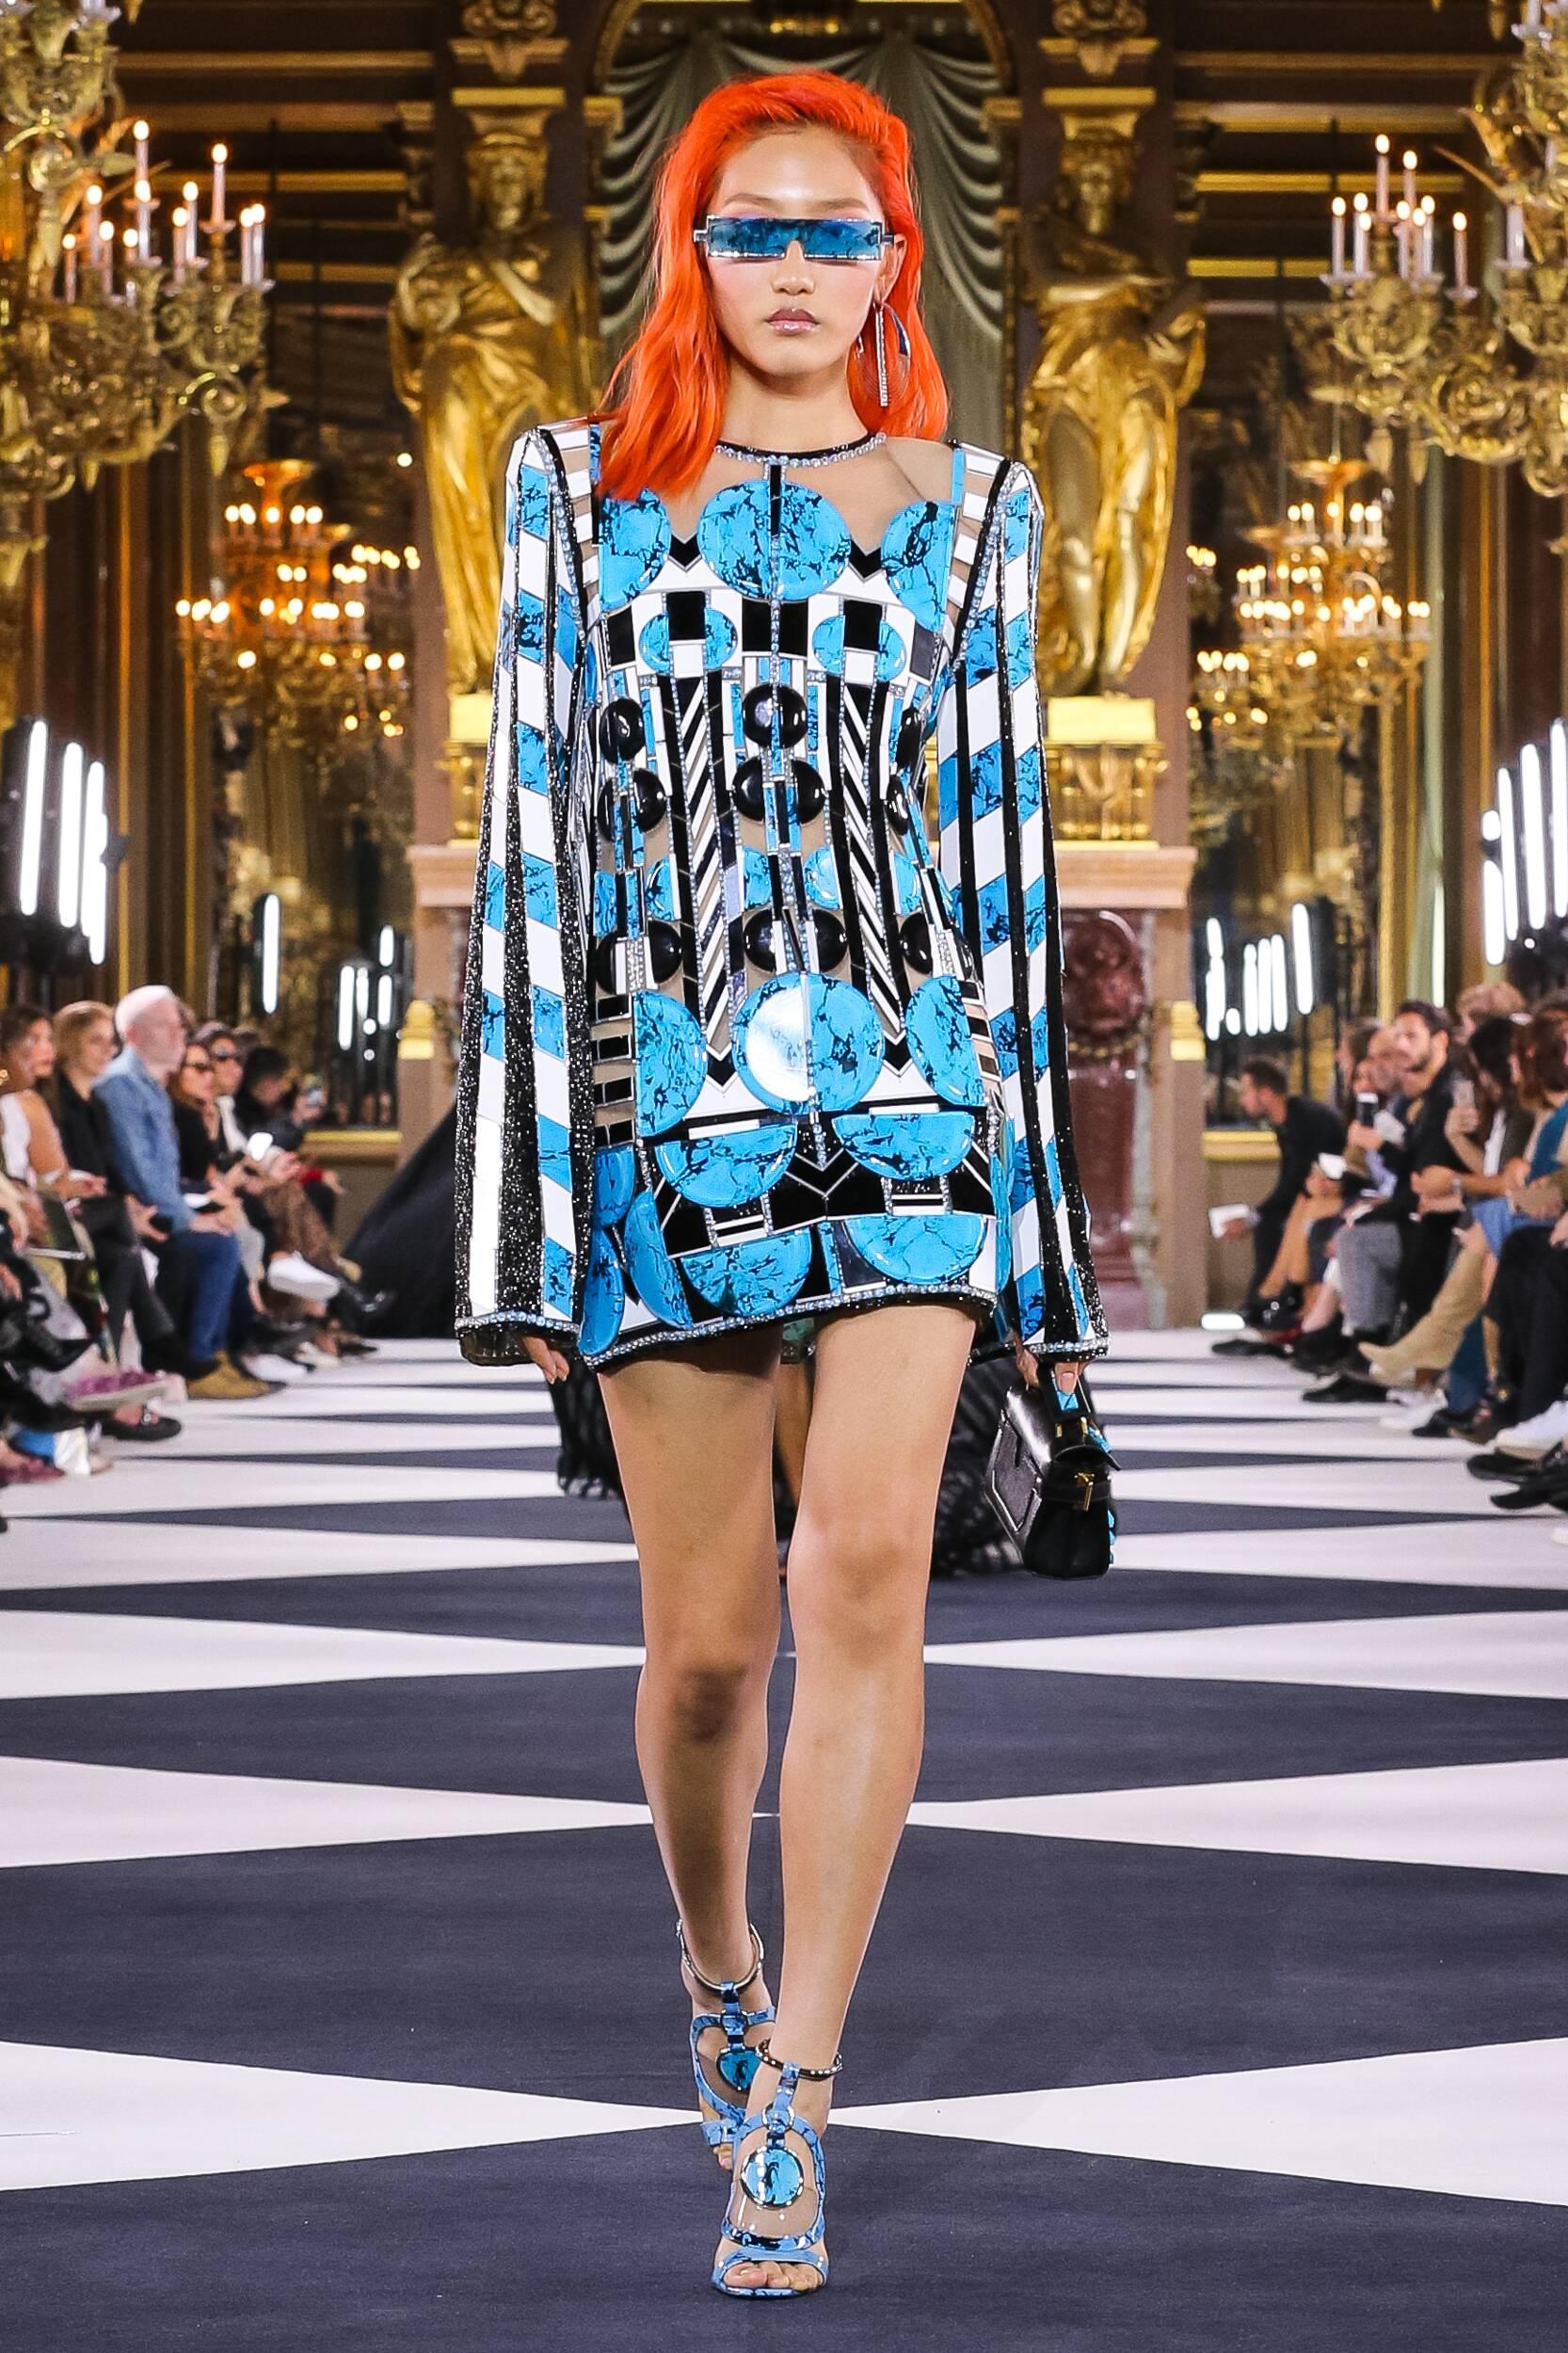 Balmain Womenswear Collection Trends Summer